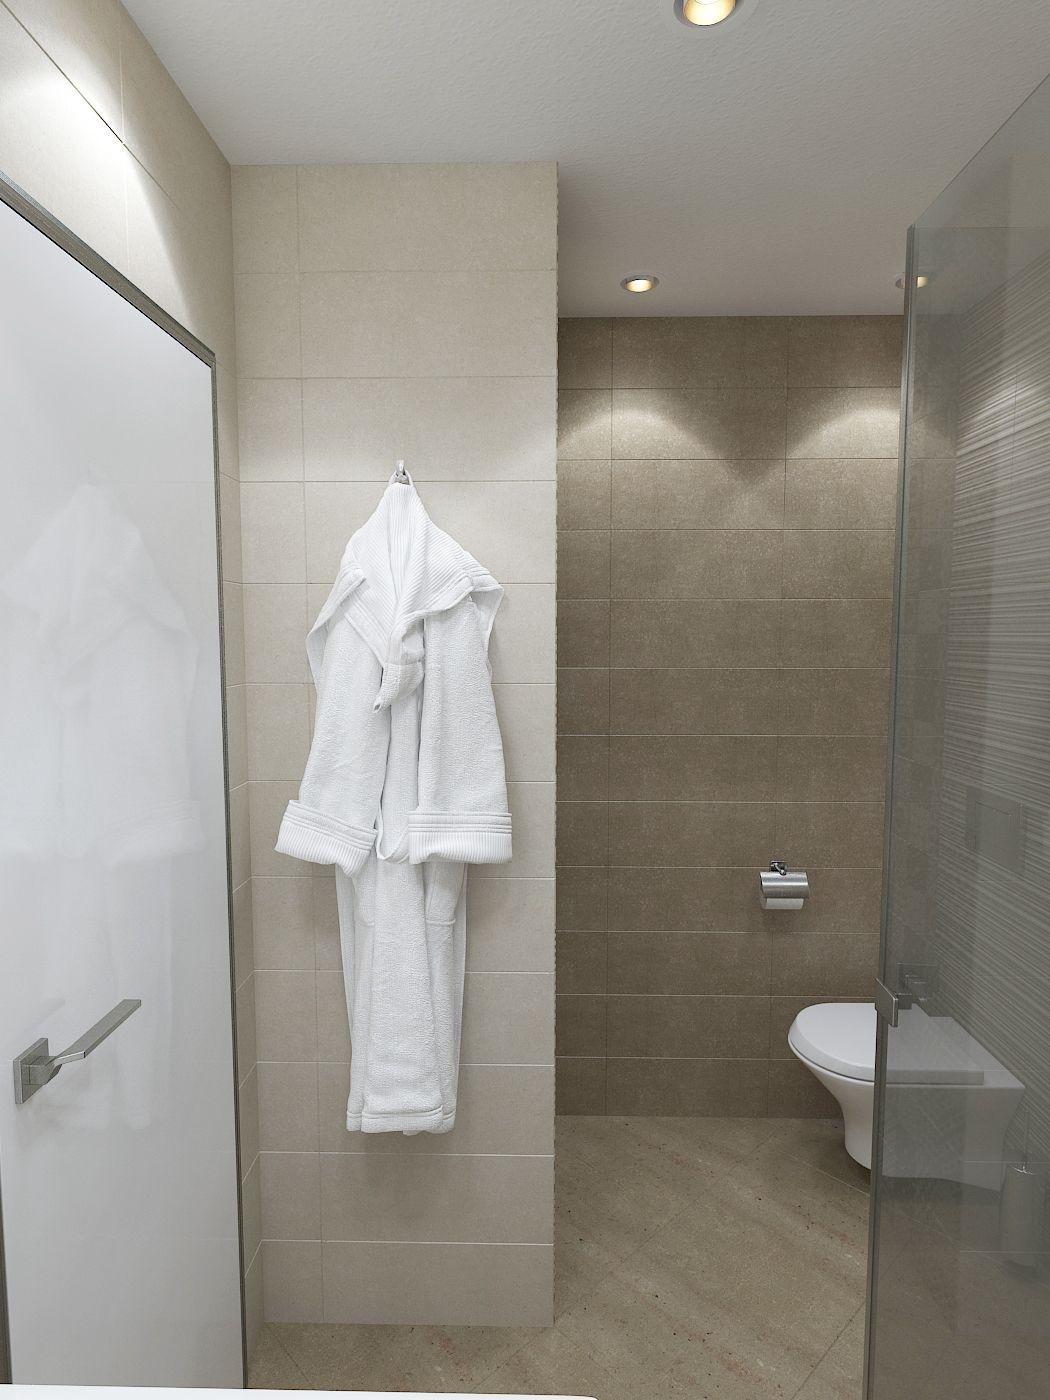 Azulejos Benadresa Metropoli Bathroom Design Visualization Bathroomdesign Bathroomrenovationideas Bathroomrenovation Interiordesign